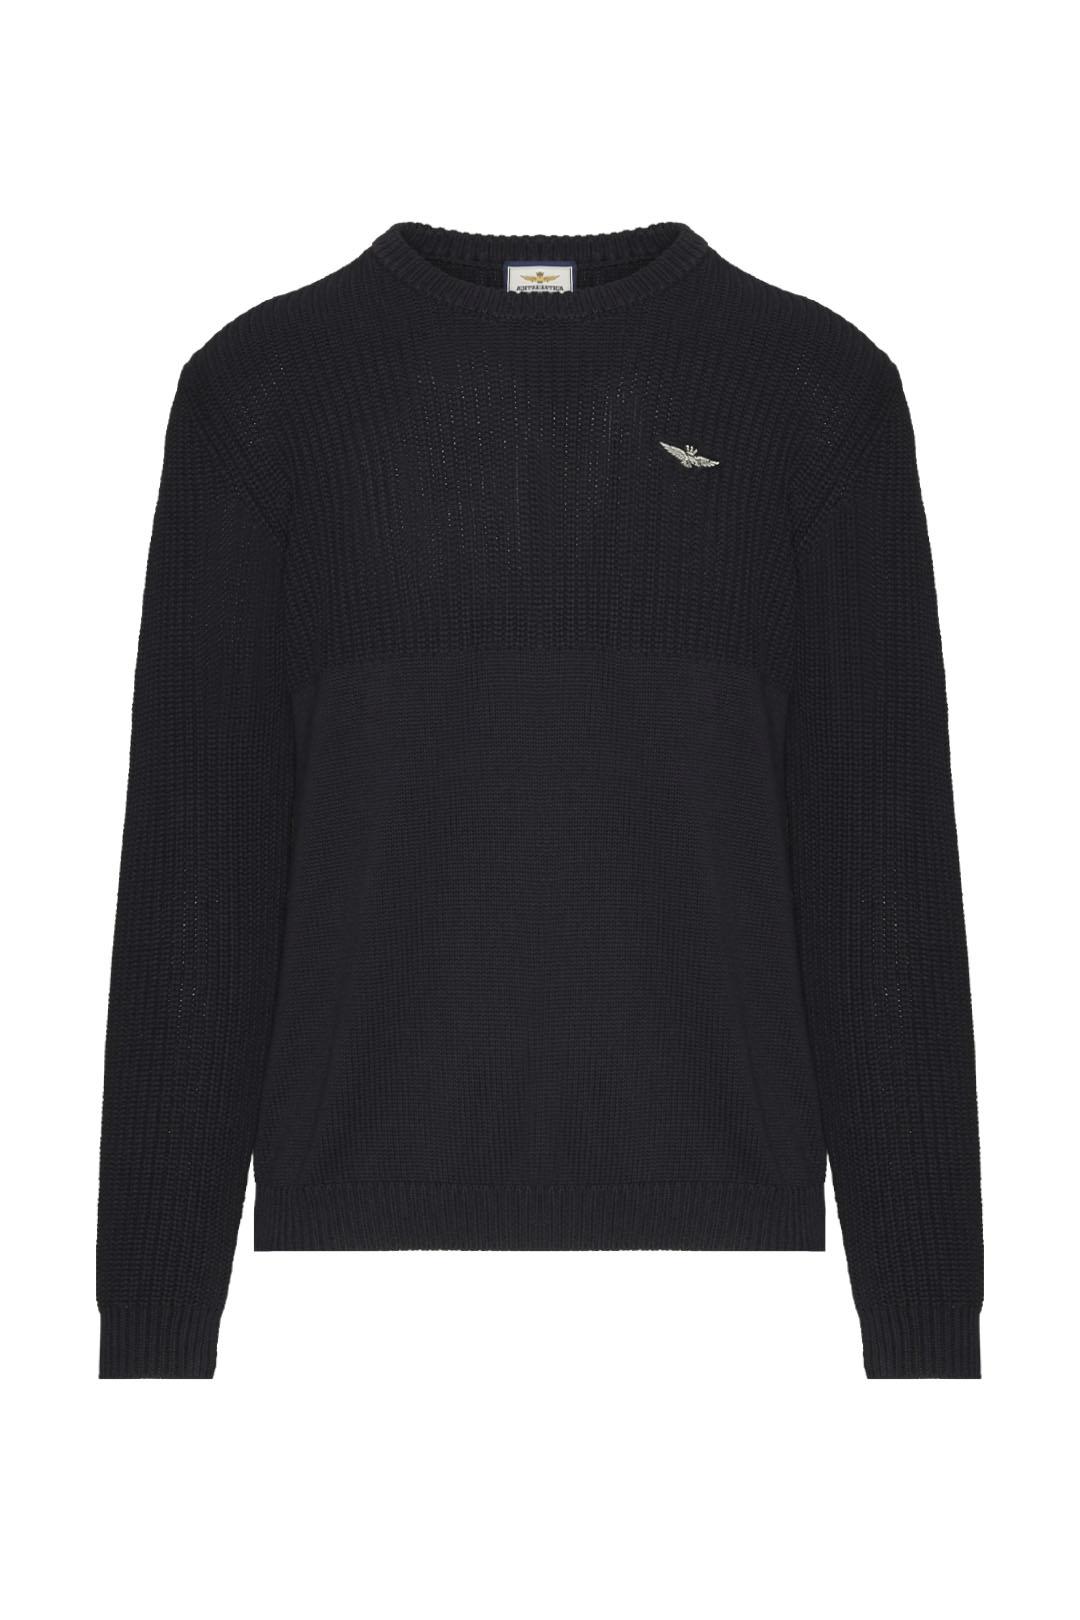 Two fabrics round neck sweater